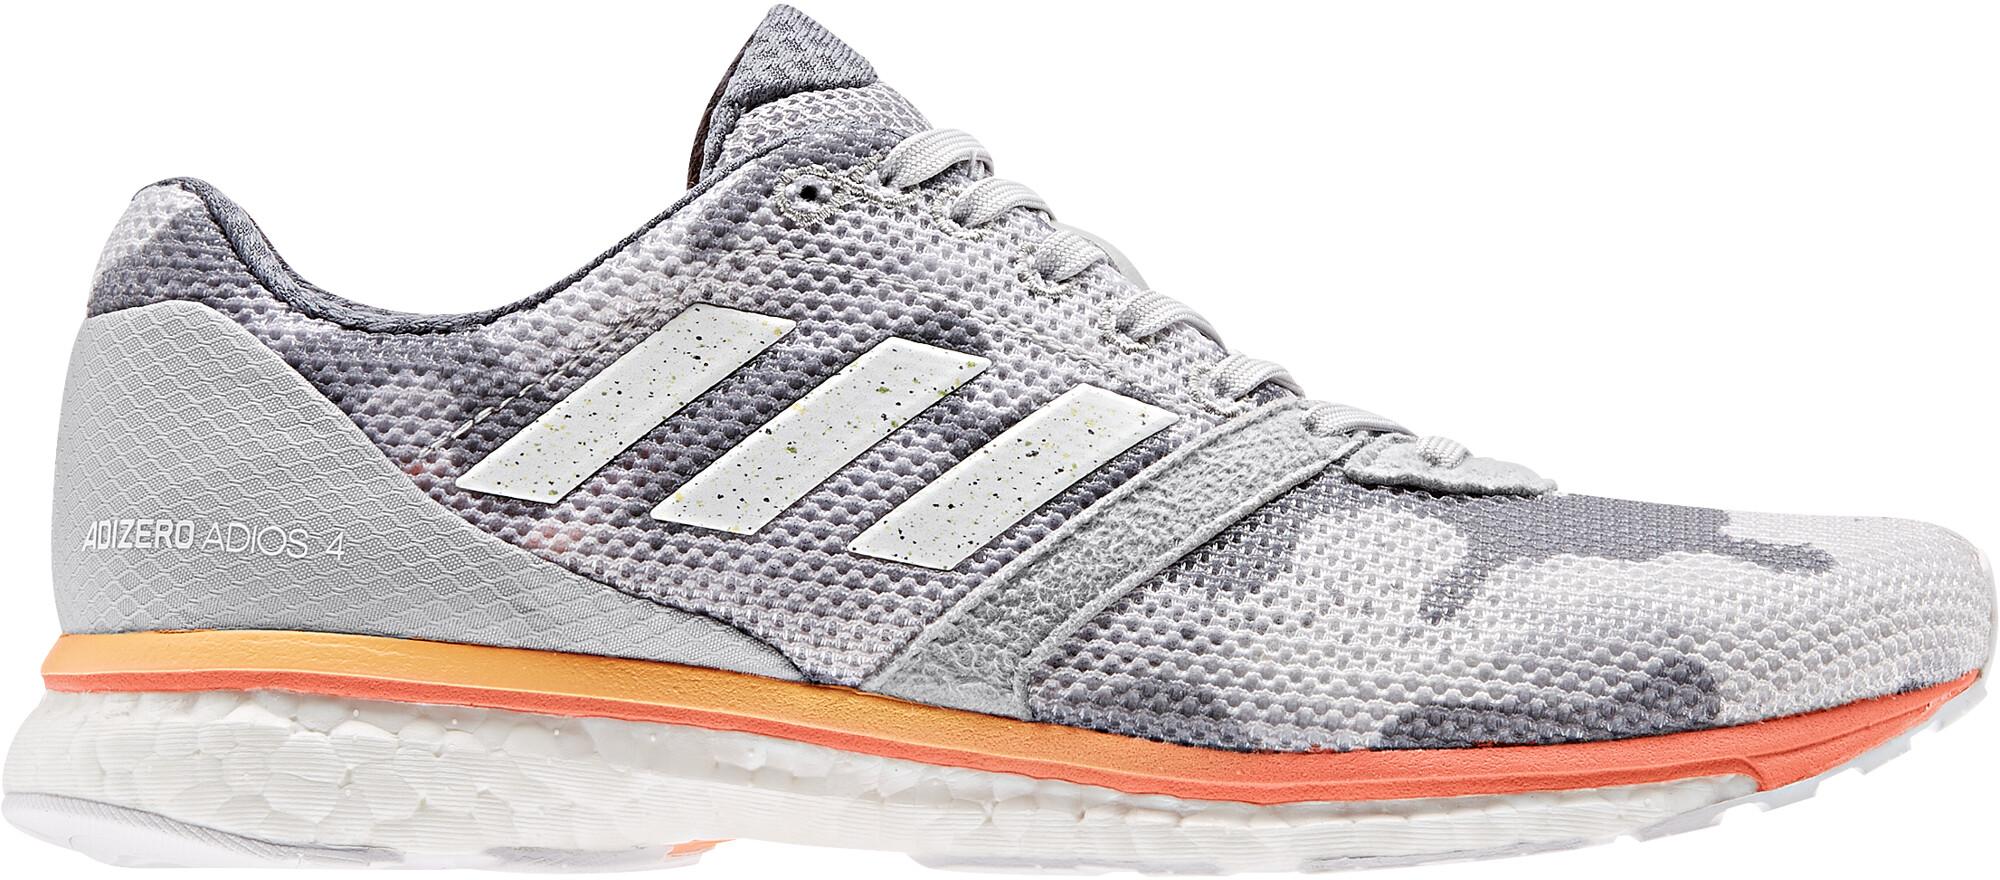 adidas Adizero Adios 4 Sko Damer, grey two/footwear white/hi-res coral (2019) | Running shoes